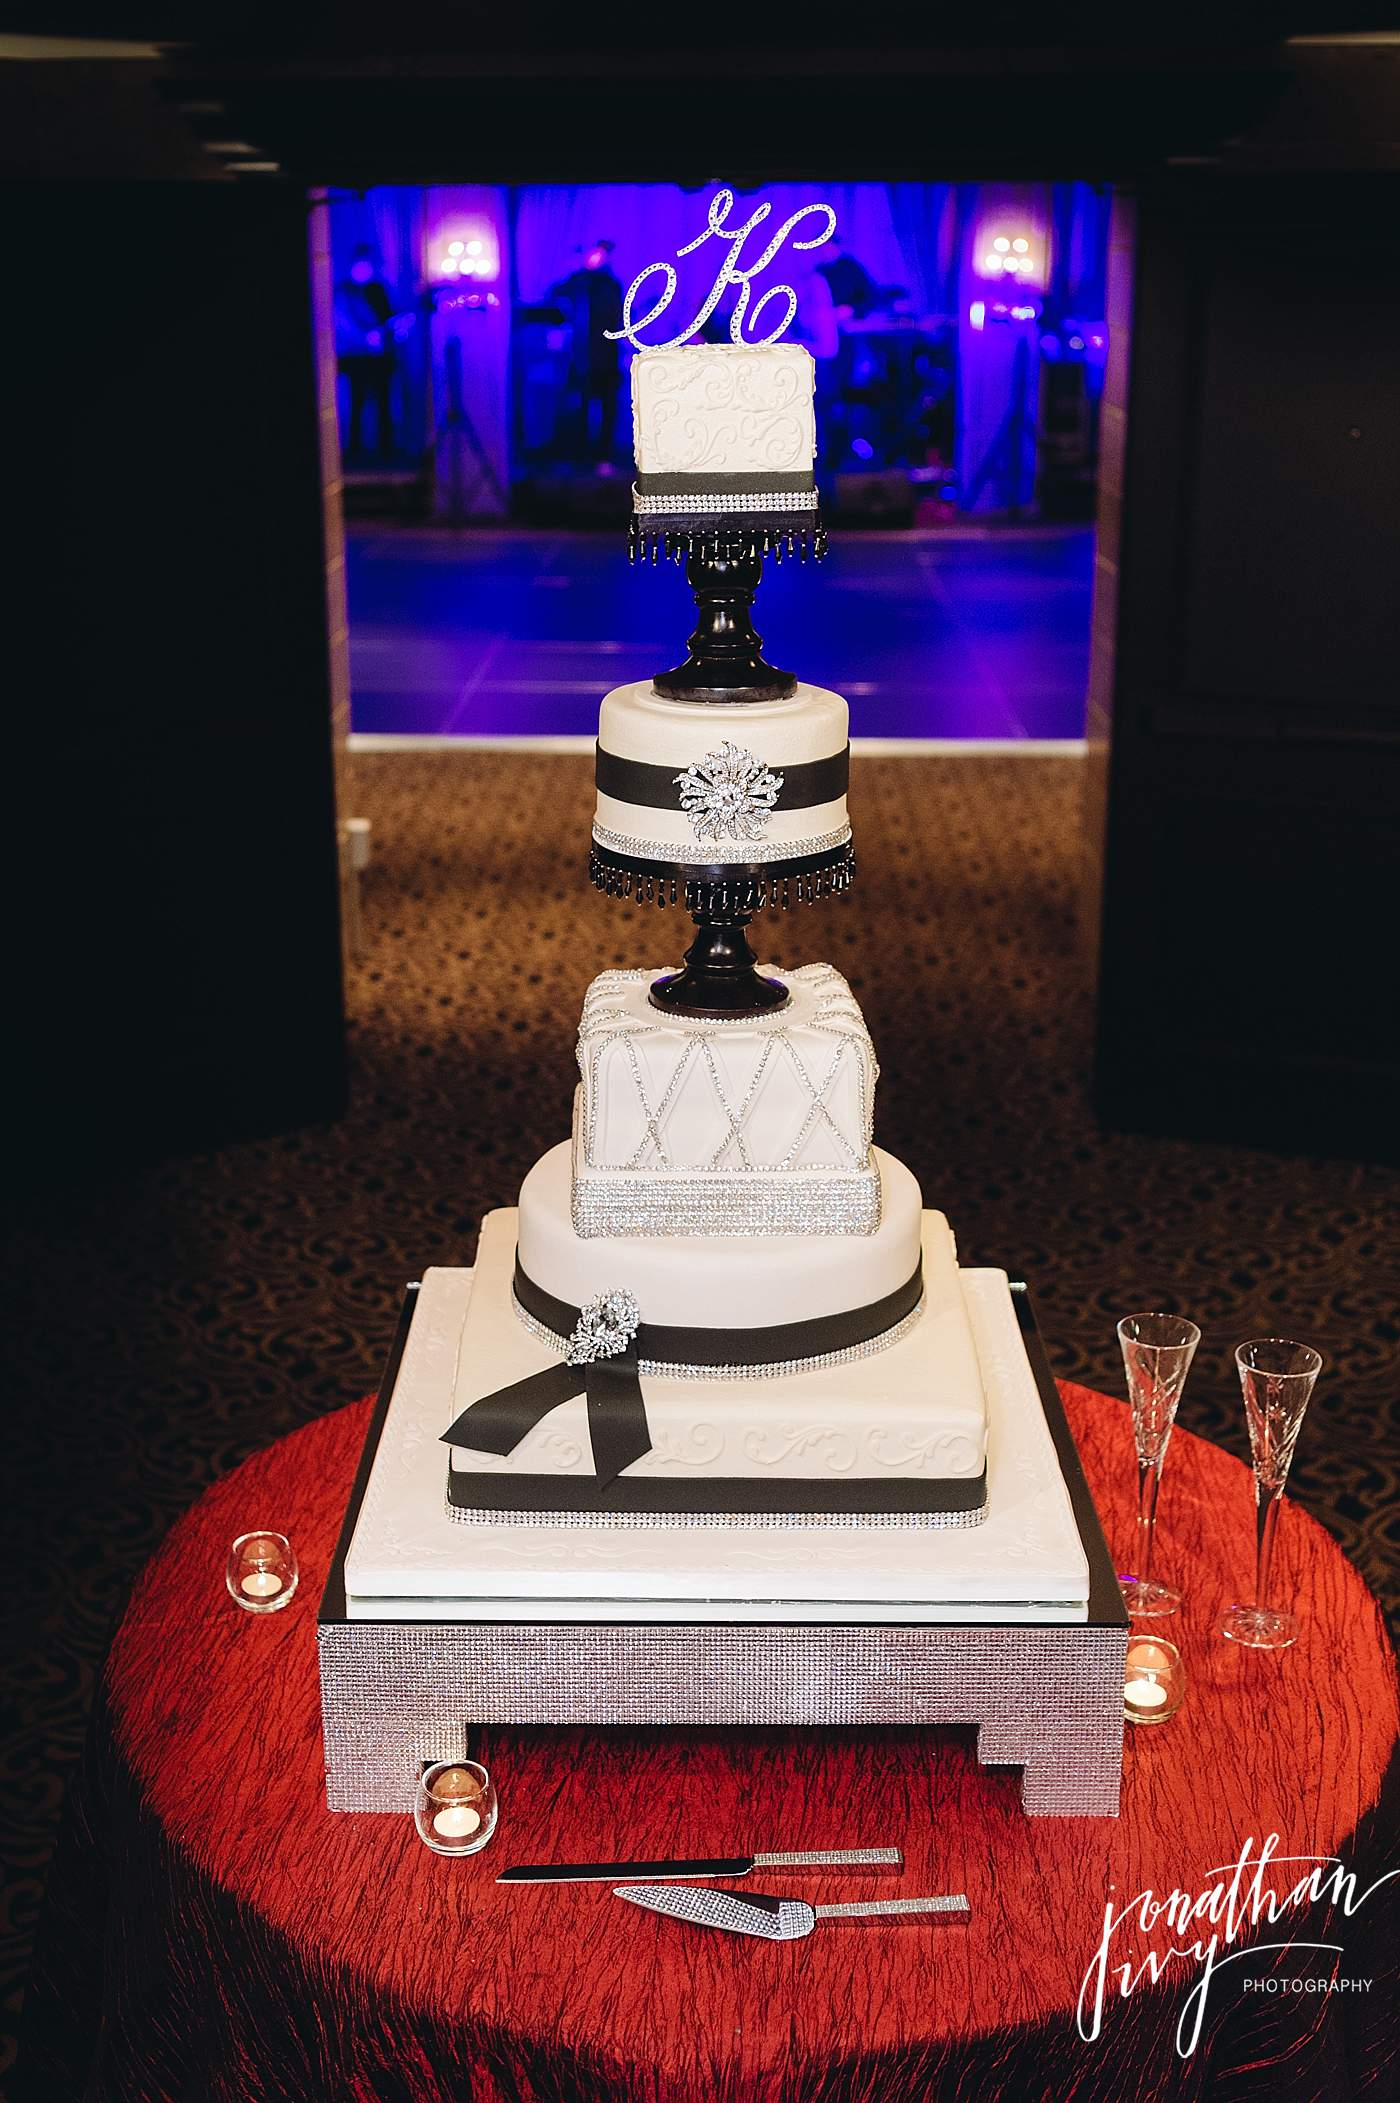 Edible Designs By Jessie Wedding Cake